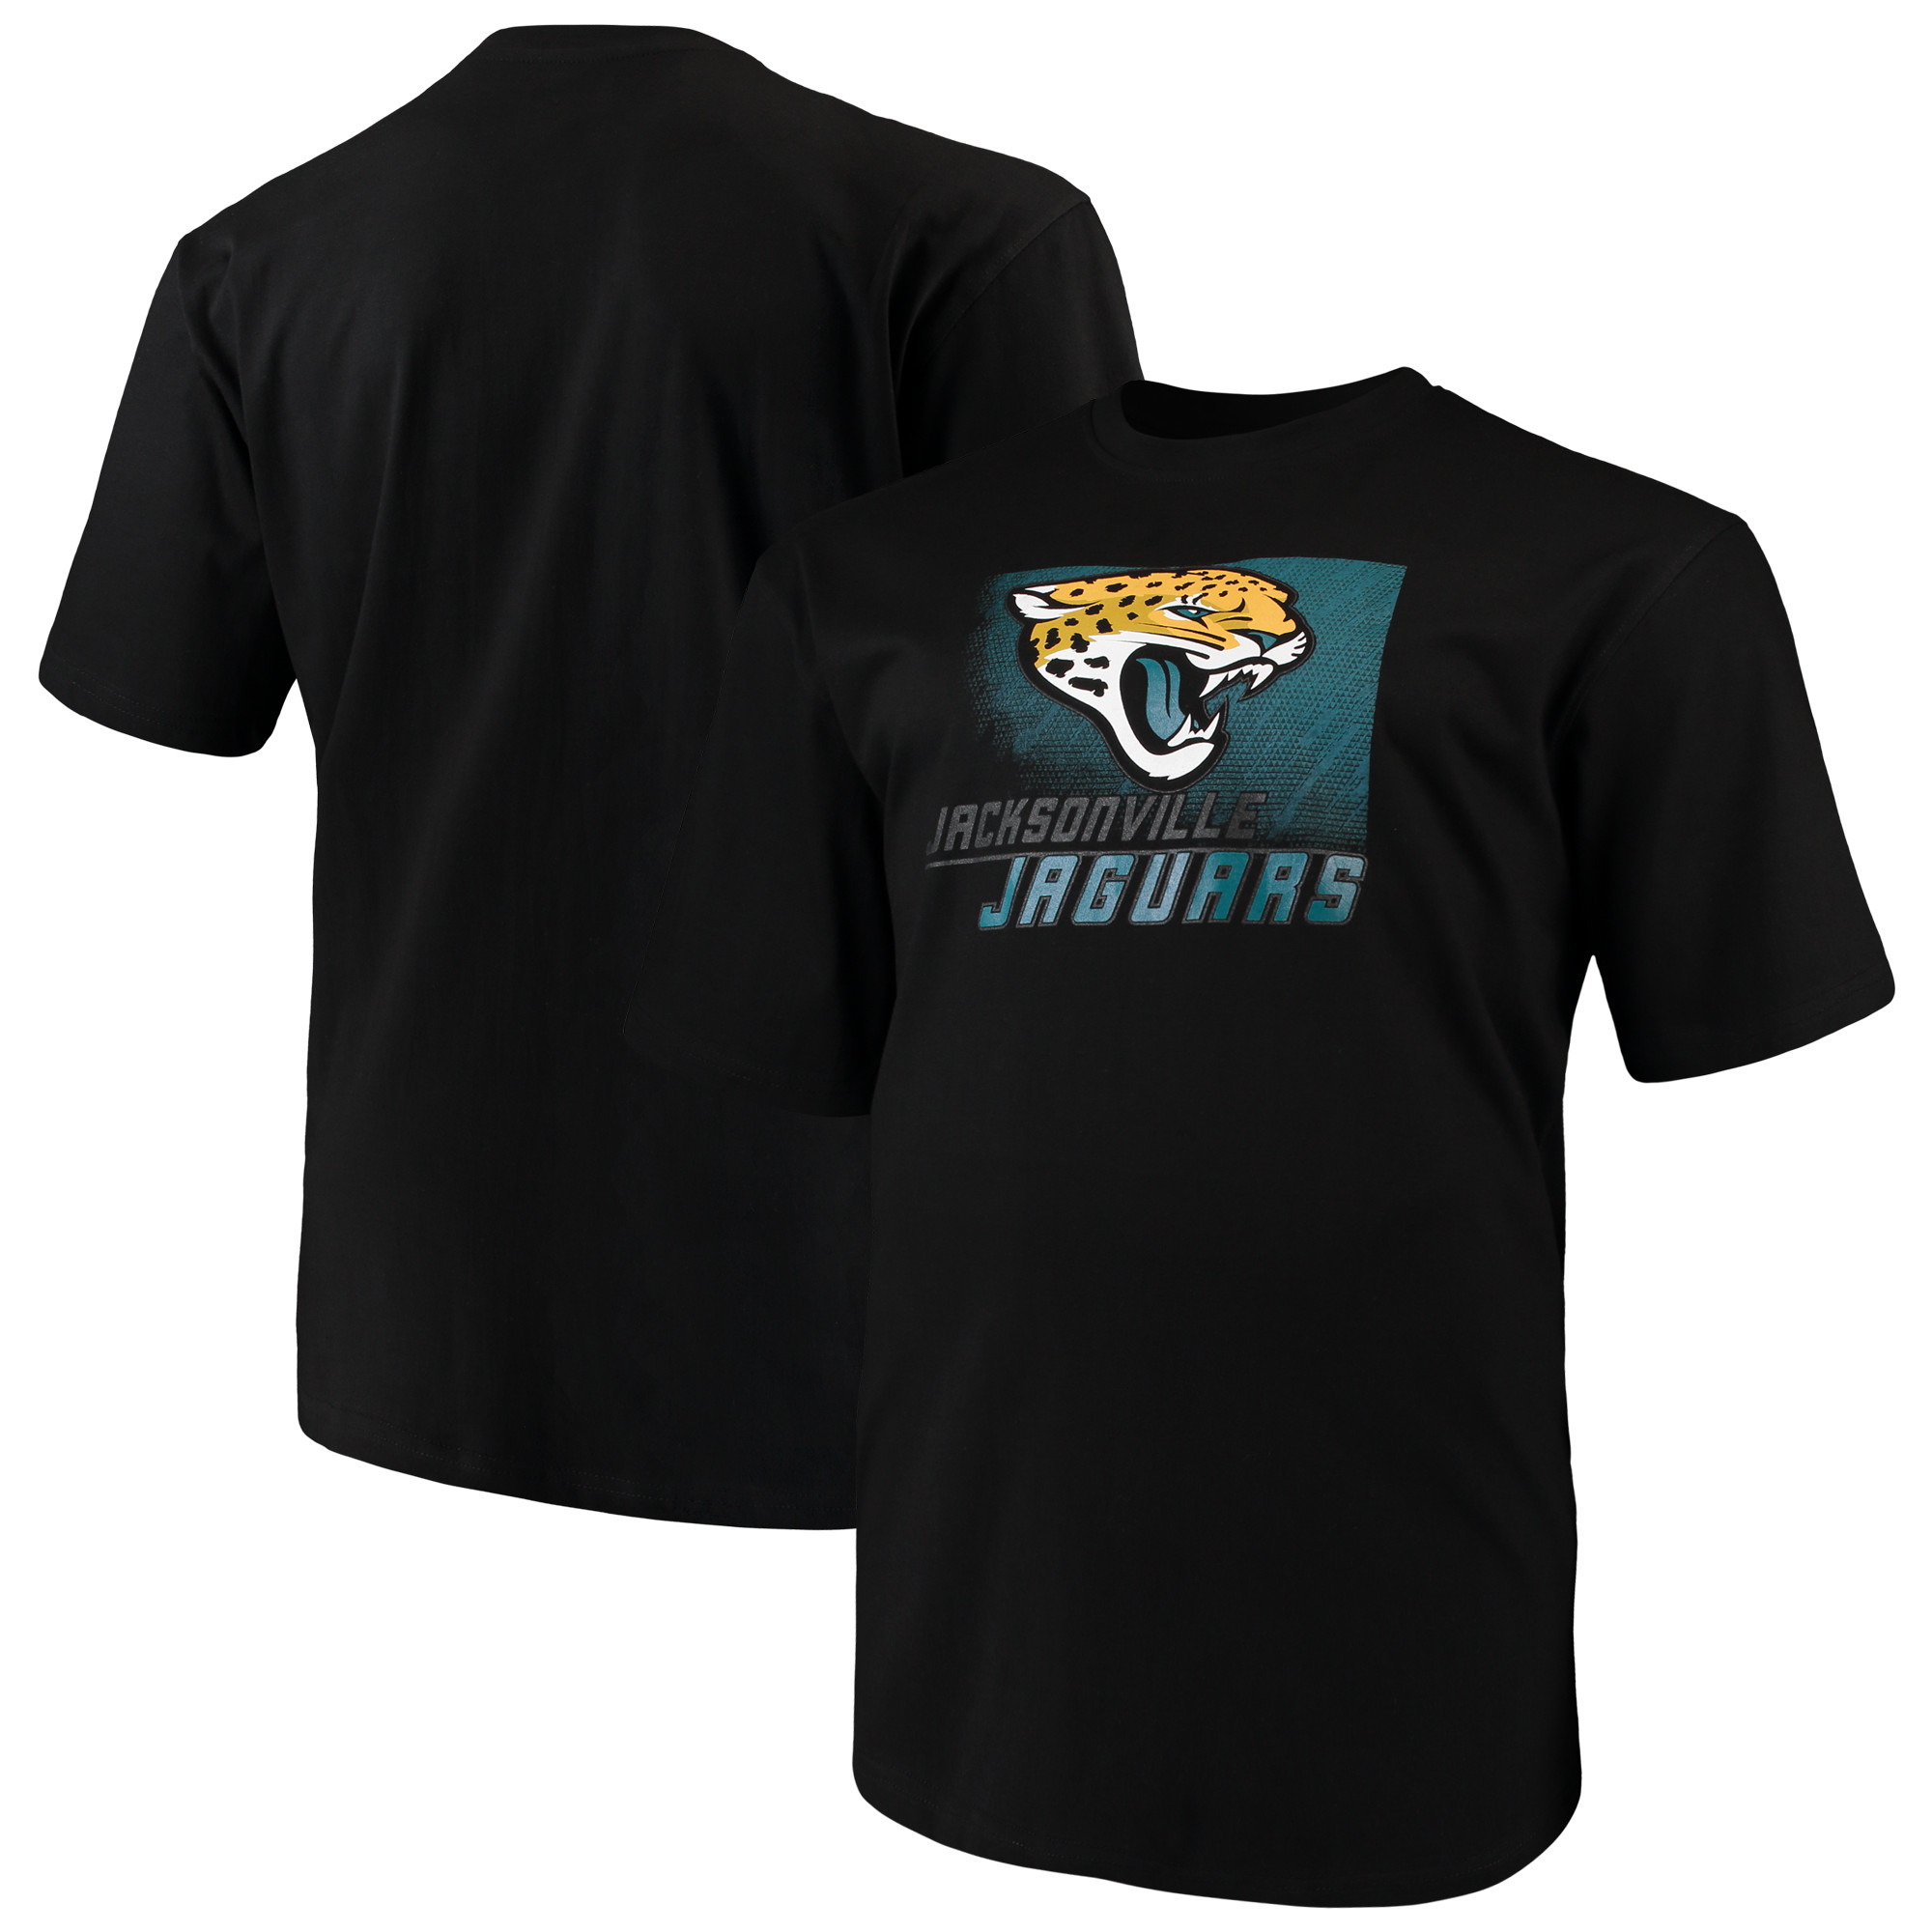 Men's Majestic Black Jacksonville Jaguars Big & Tall Reflective T-Shirt